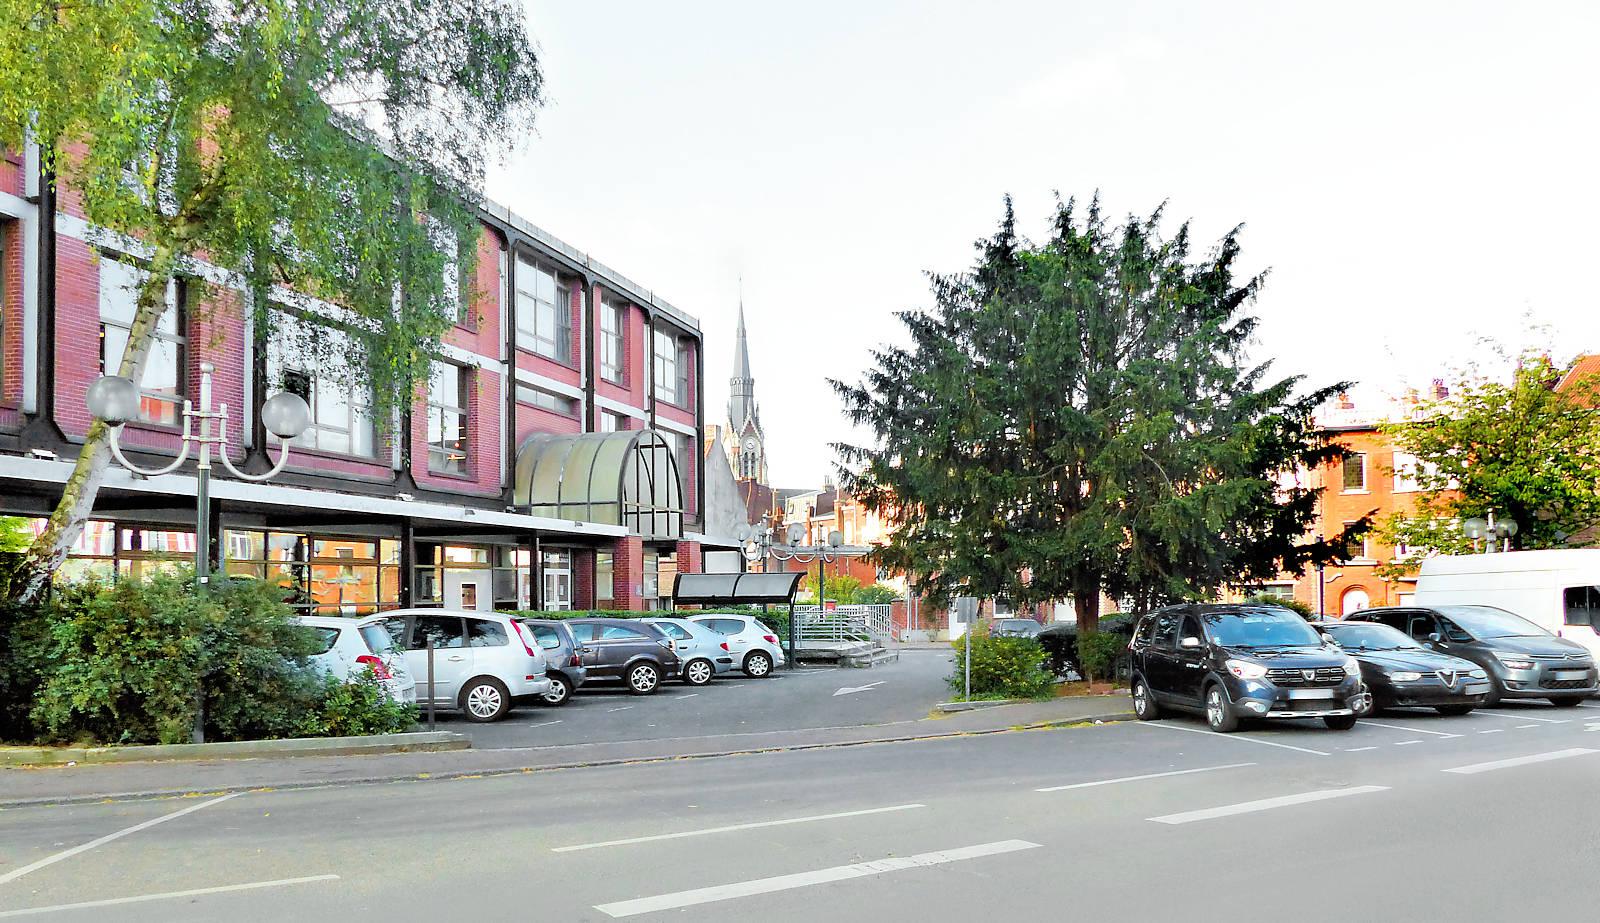 Médiathèque André Malraux - Tourcoing, 26 rue Famelart.